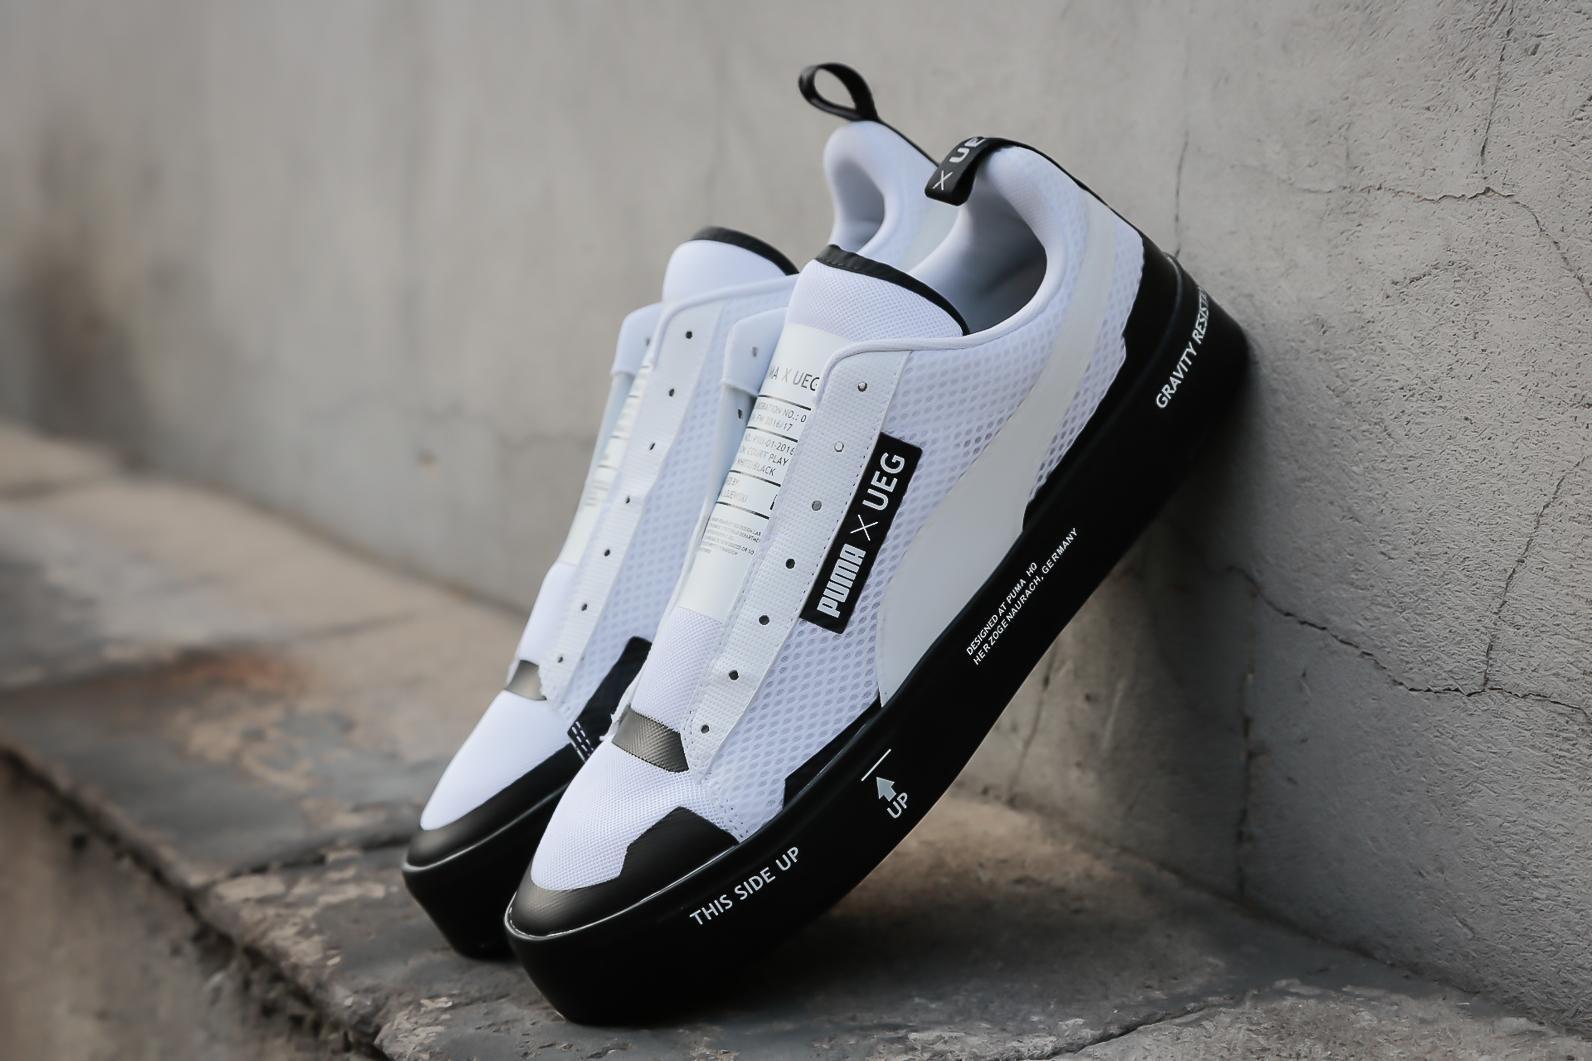 Pumacourtplaysliponxueg sneakers pinterest pumas pumacourtplaysliponxueg nvjuhfo Choice Image